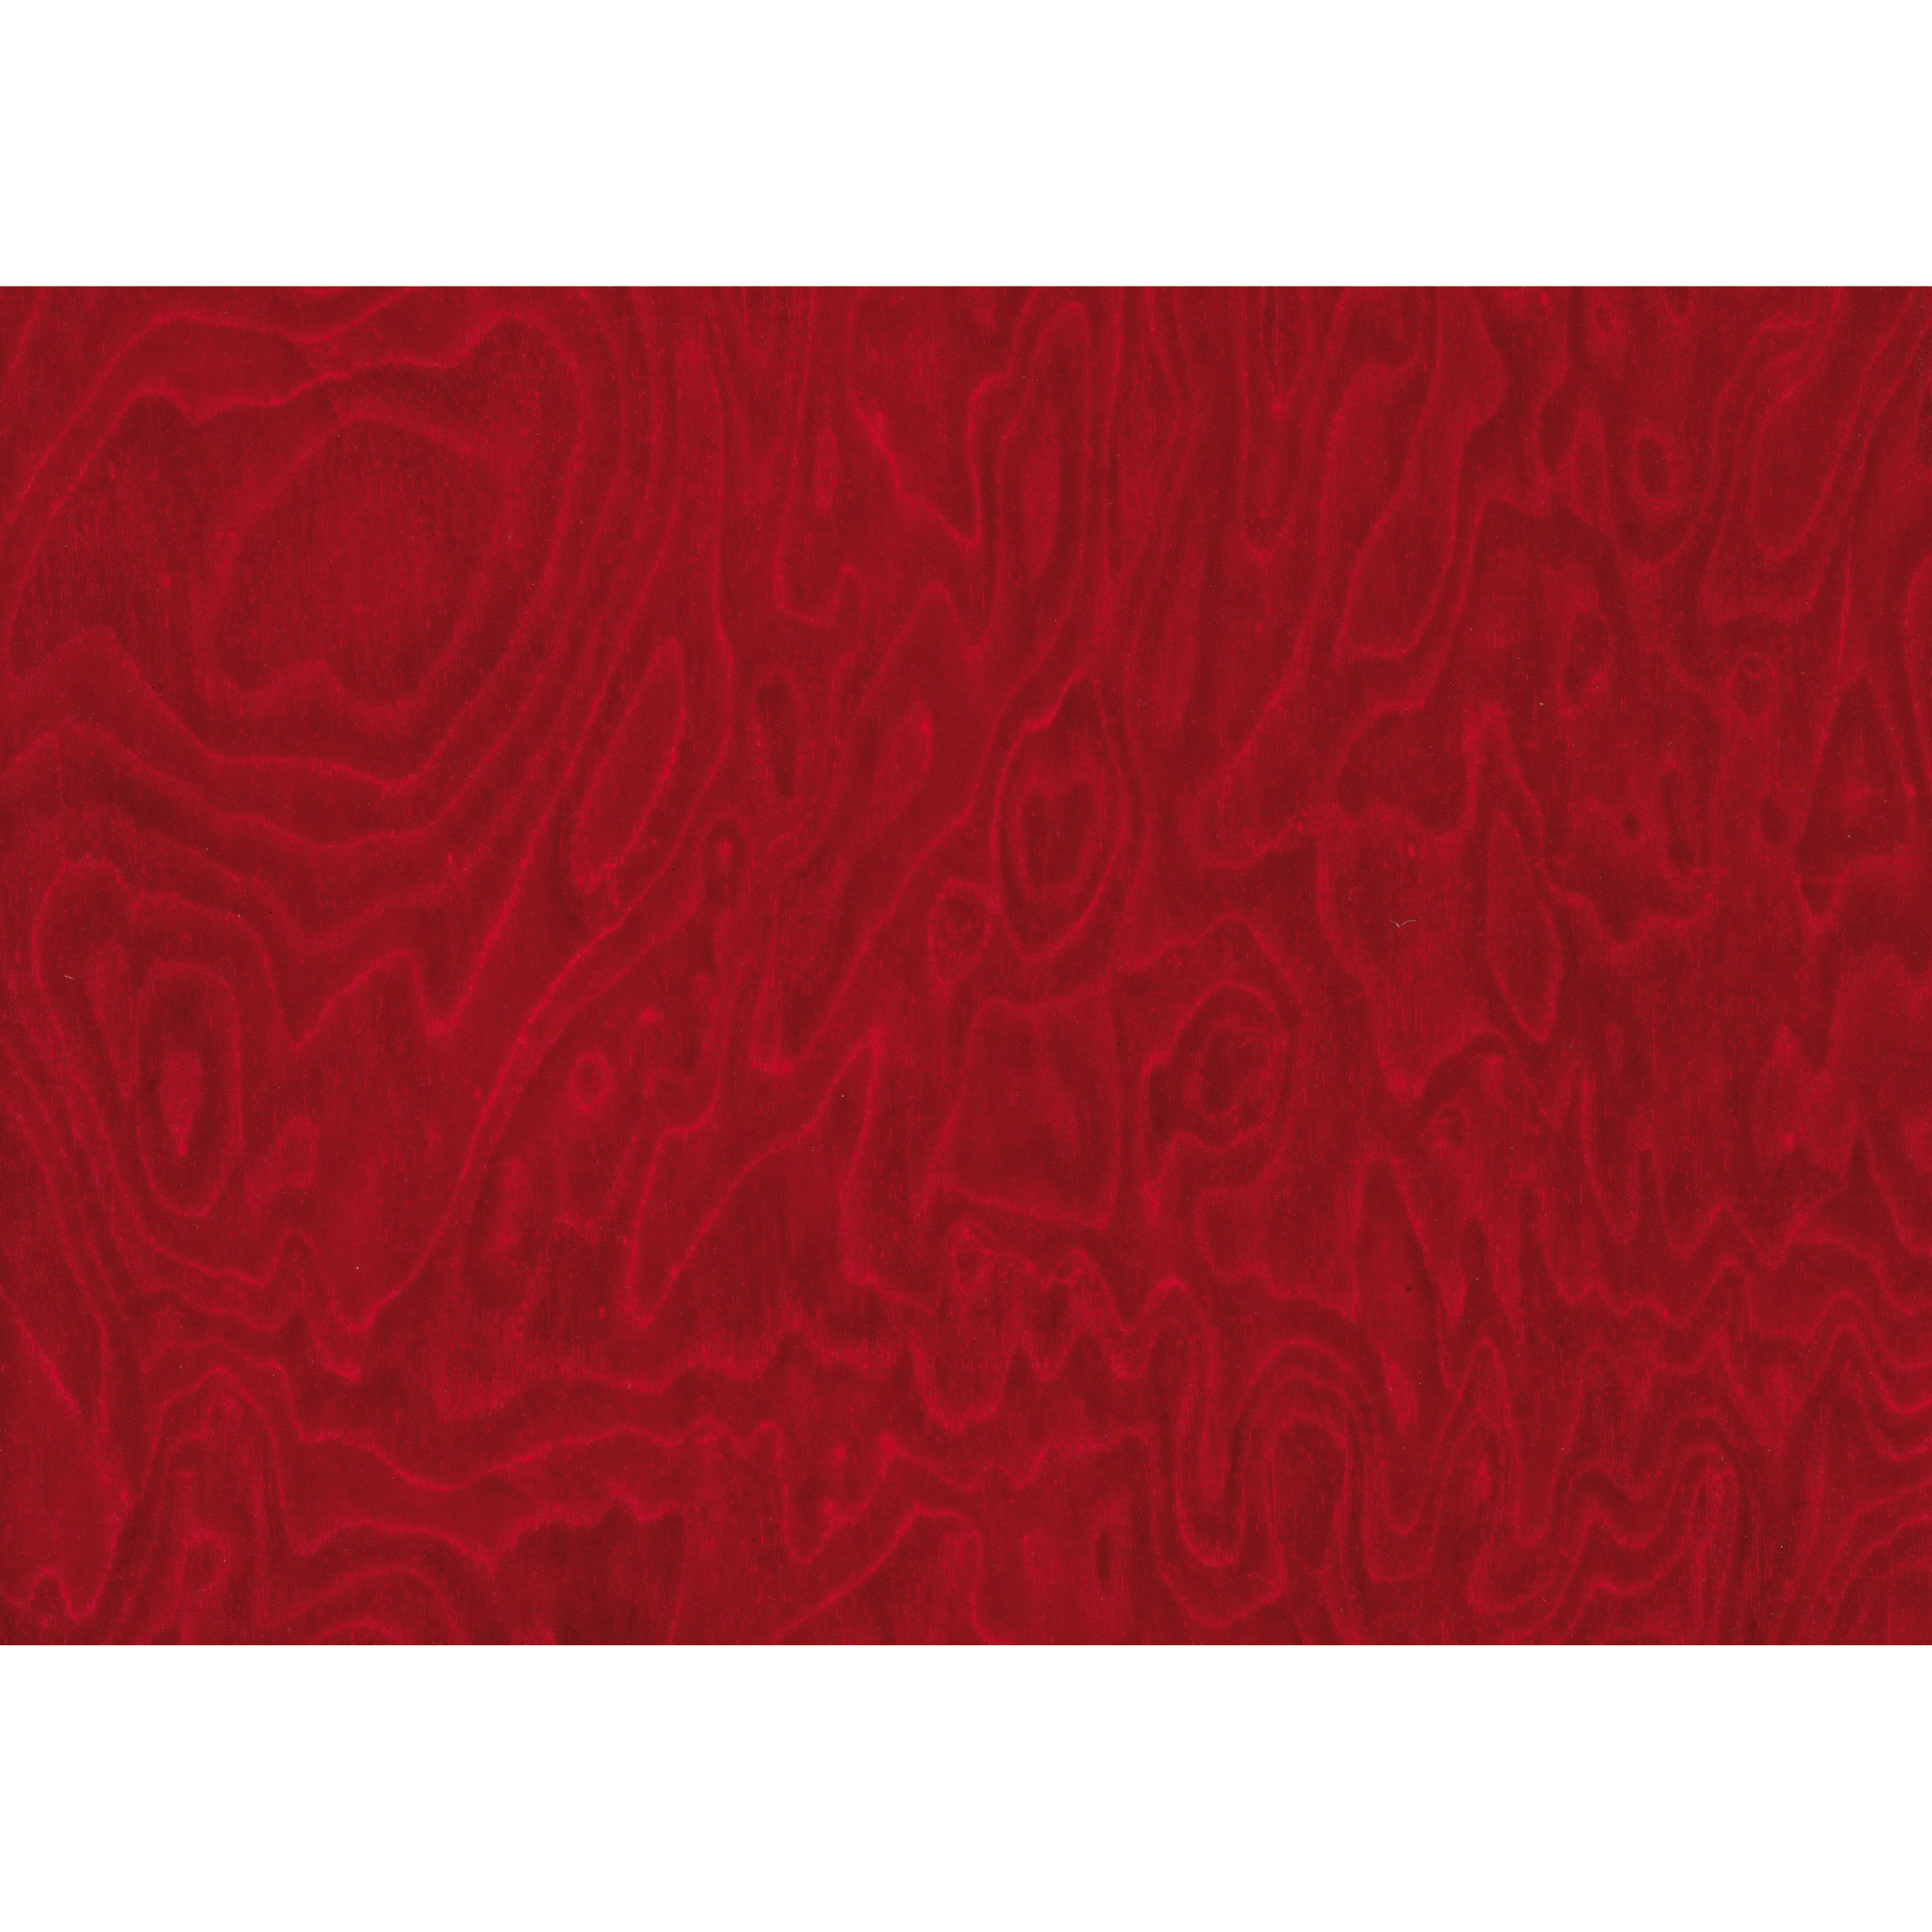 Hartie pt. ambalare 70 x 200cm/rola 70gr/mp rosu HERLITZ Moiree